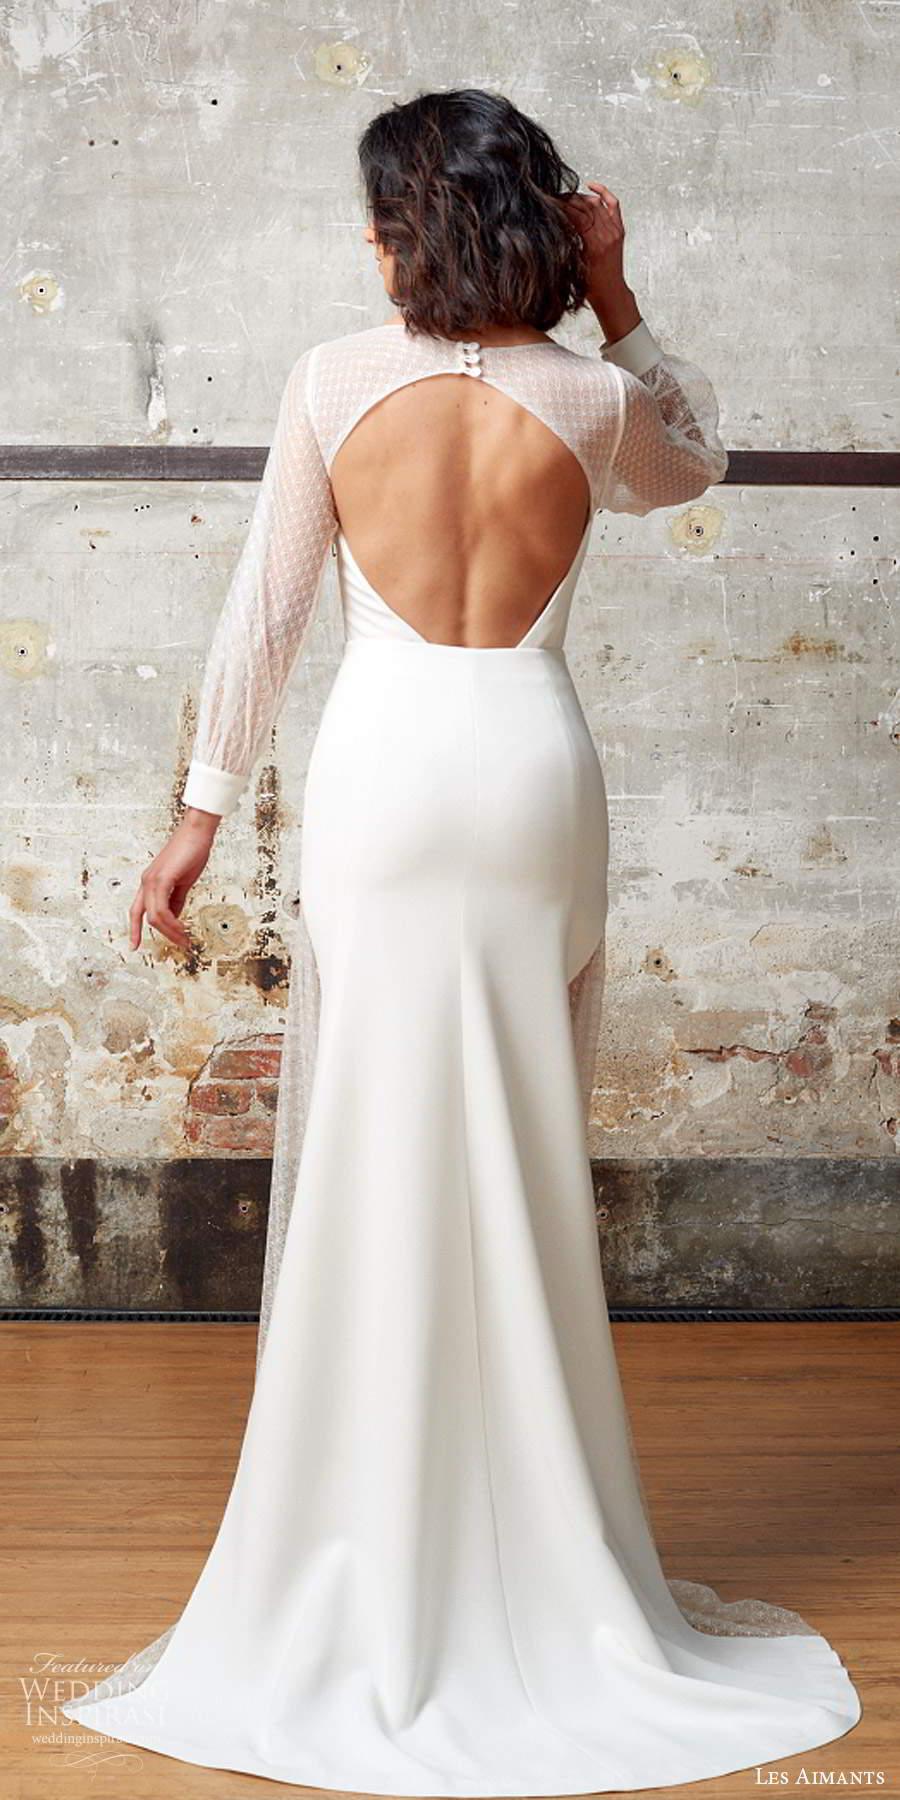 les aimants 2019 bridal illusion bishop sleeves jewel neckline clean minimally embellished sheath trumpet wedding dress cutout back chapel train (5) bv